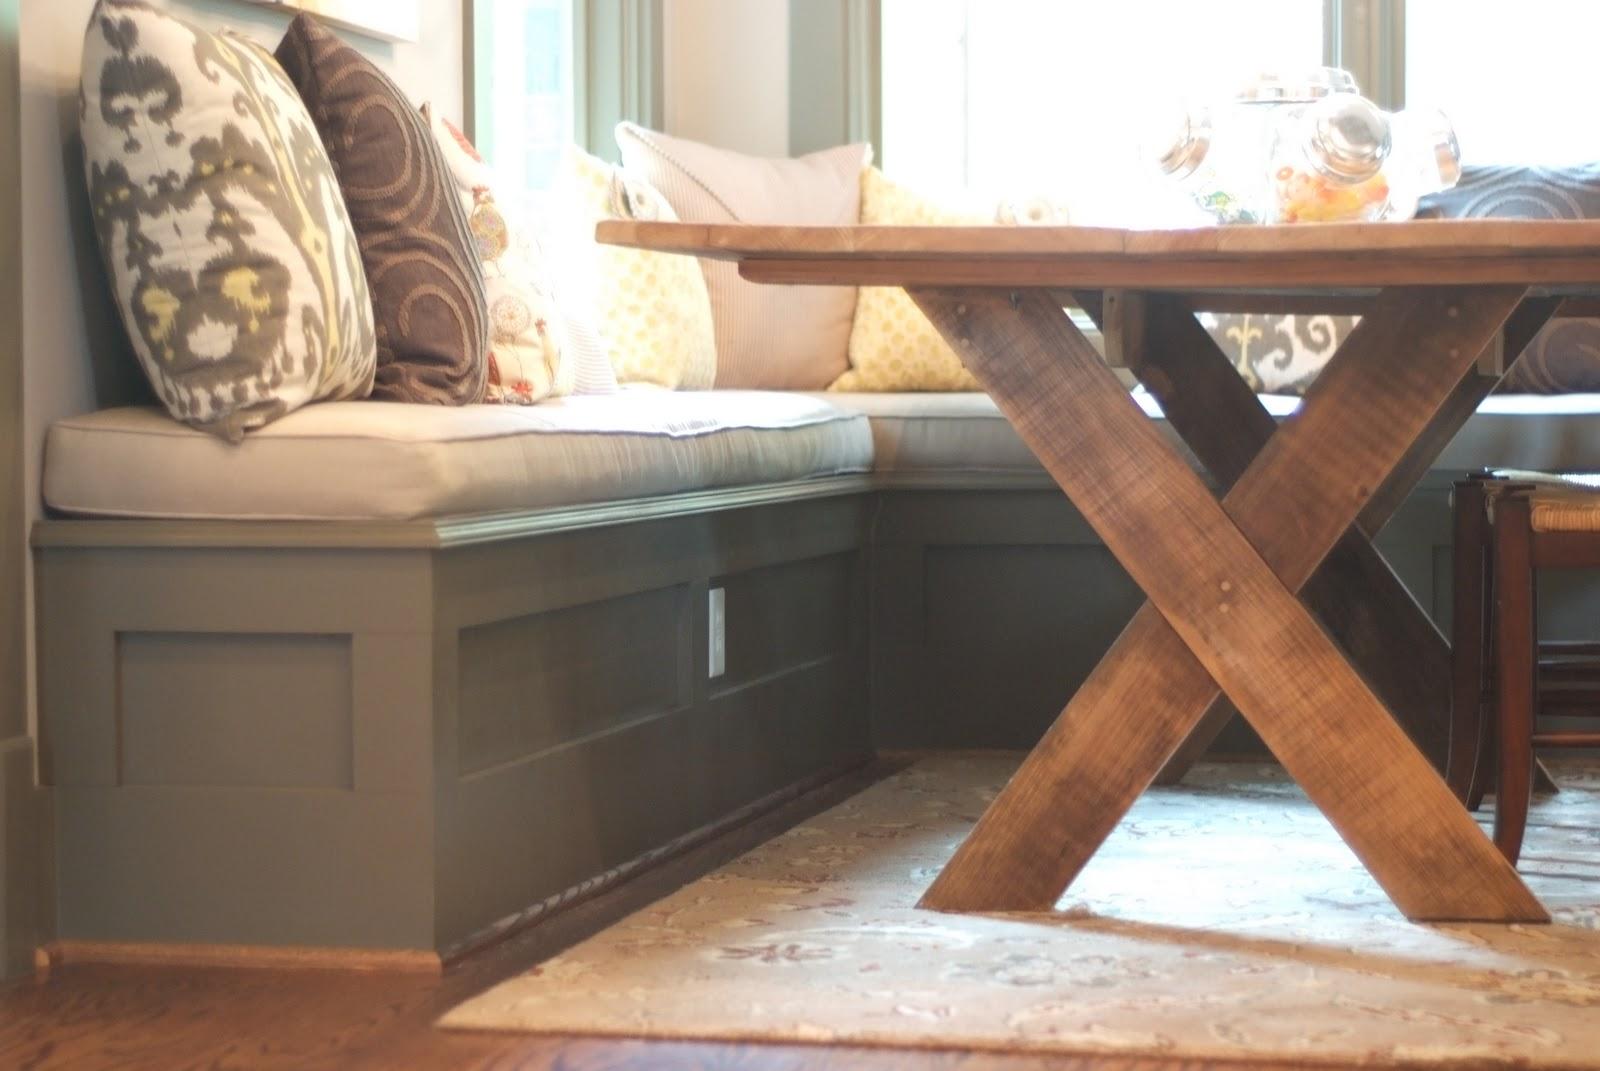 kiwi wood werks designs designs custom breakfast. Black Bedroom Furniture Sets. Home Design Ideas